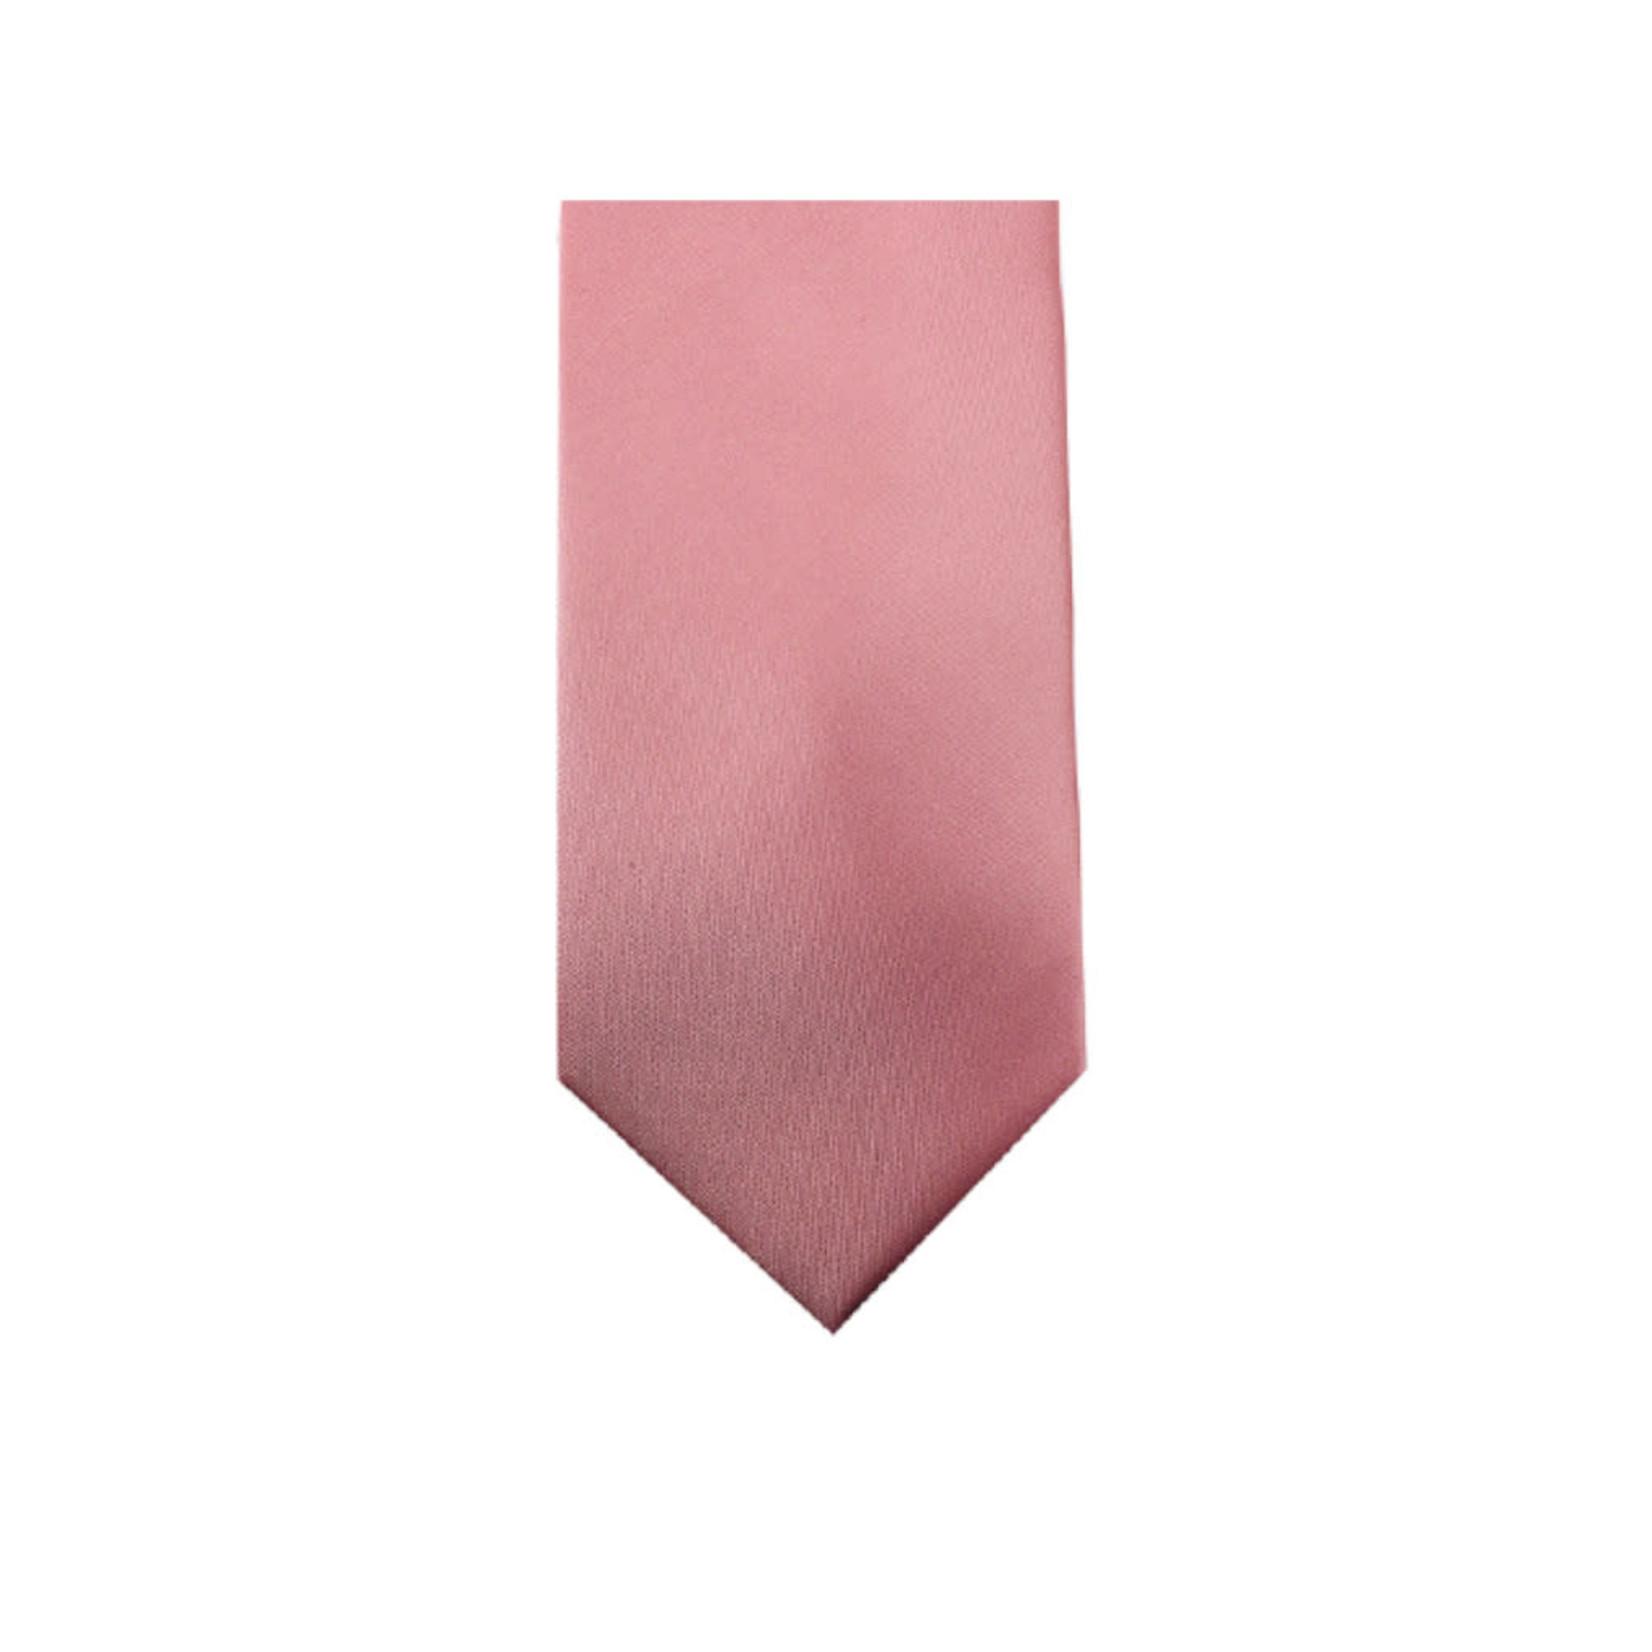 Knotz M100-54 Solid Antique Rose Tie